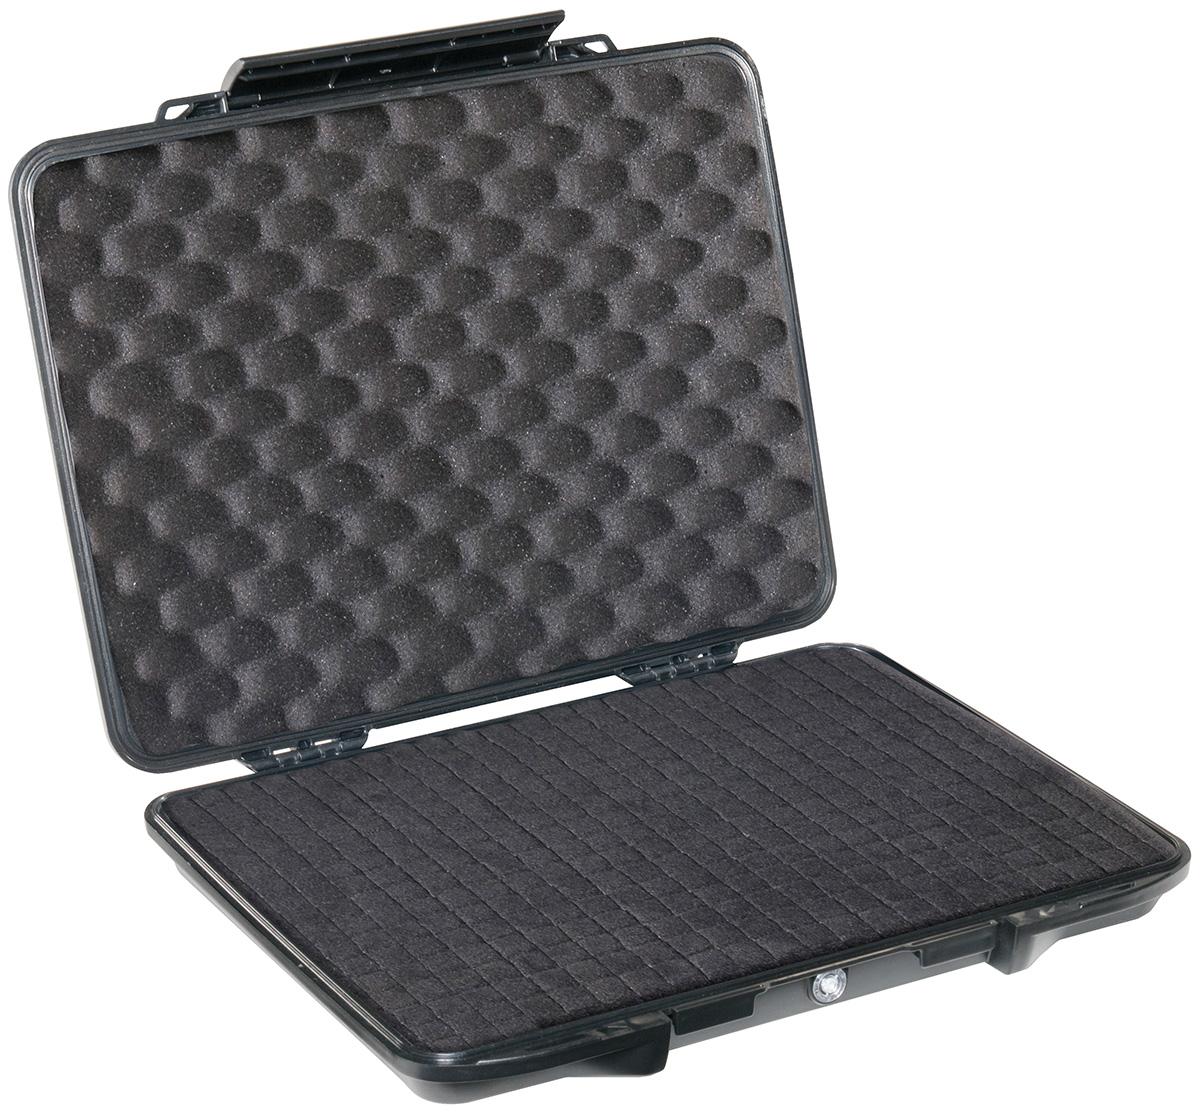 pelican tough waterproof laptop lifetime case